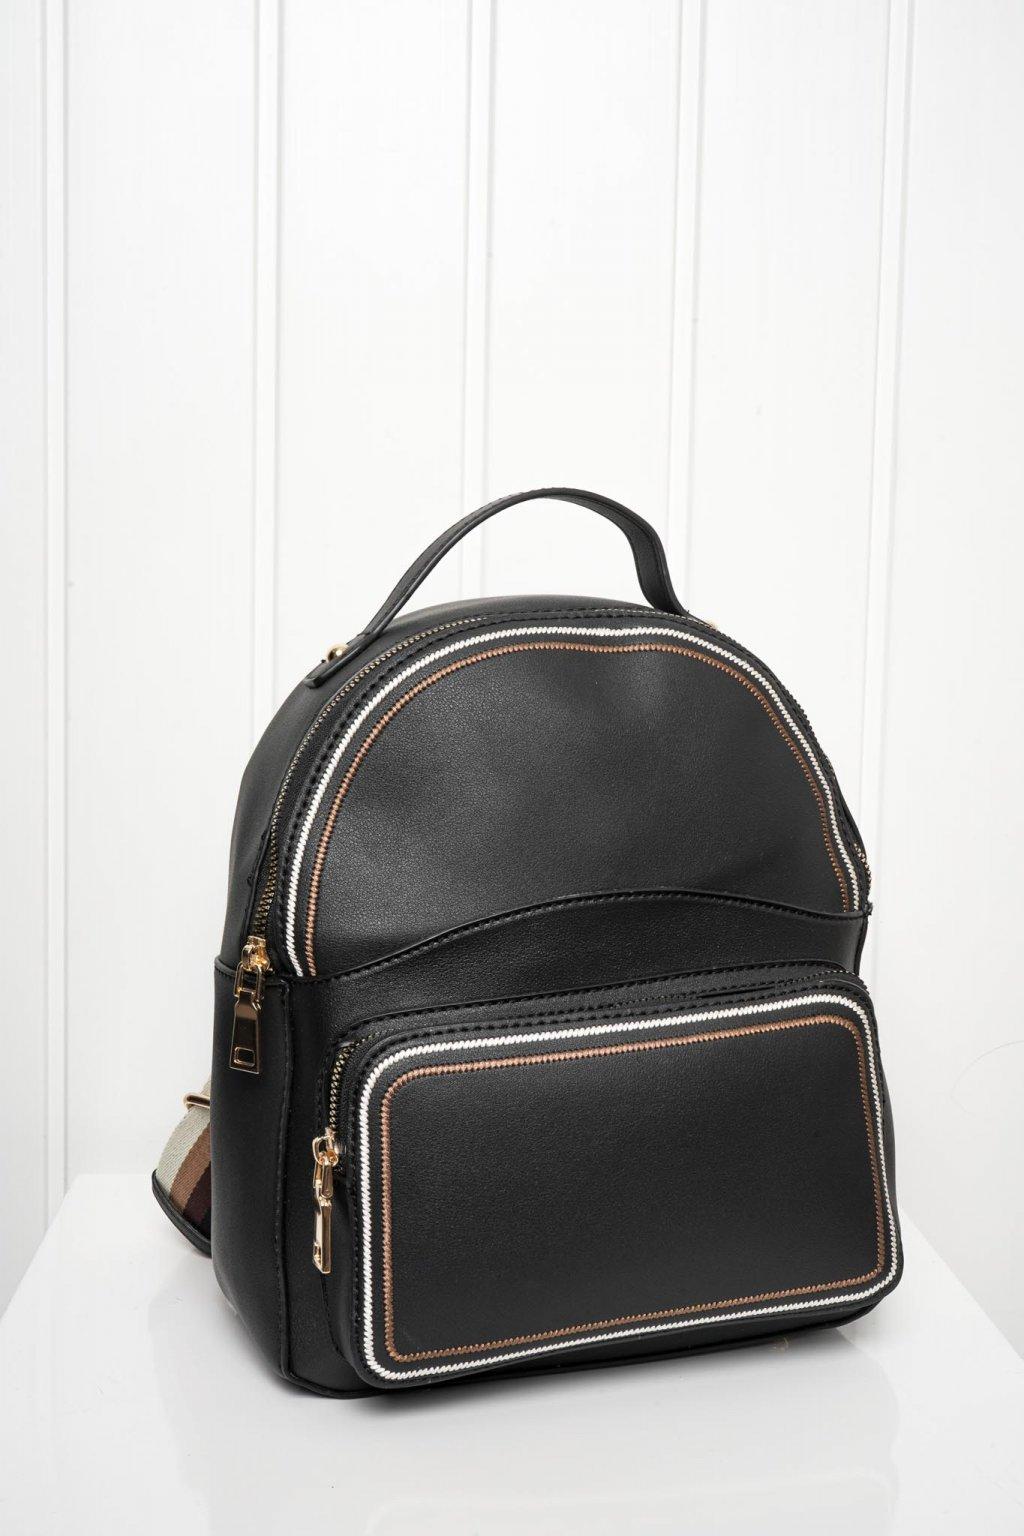 Kabelka, crossbody, ruksak, shopping bag, shopperka, 458